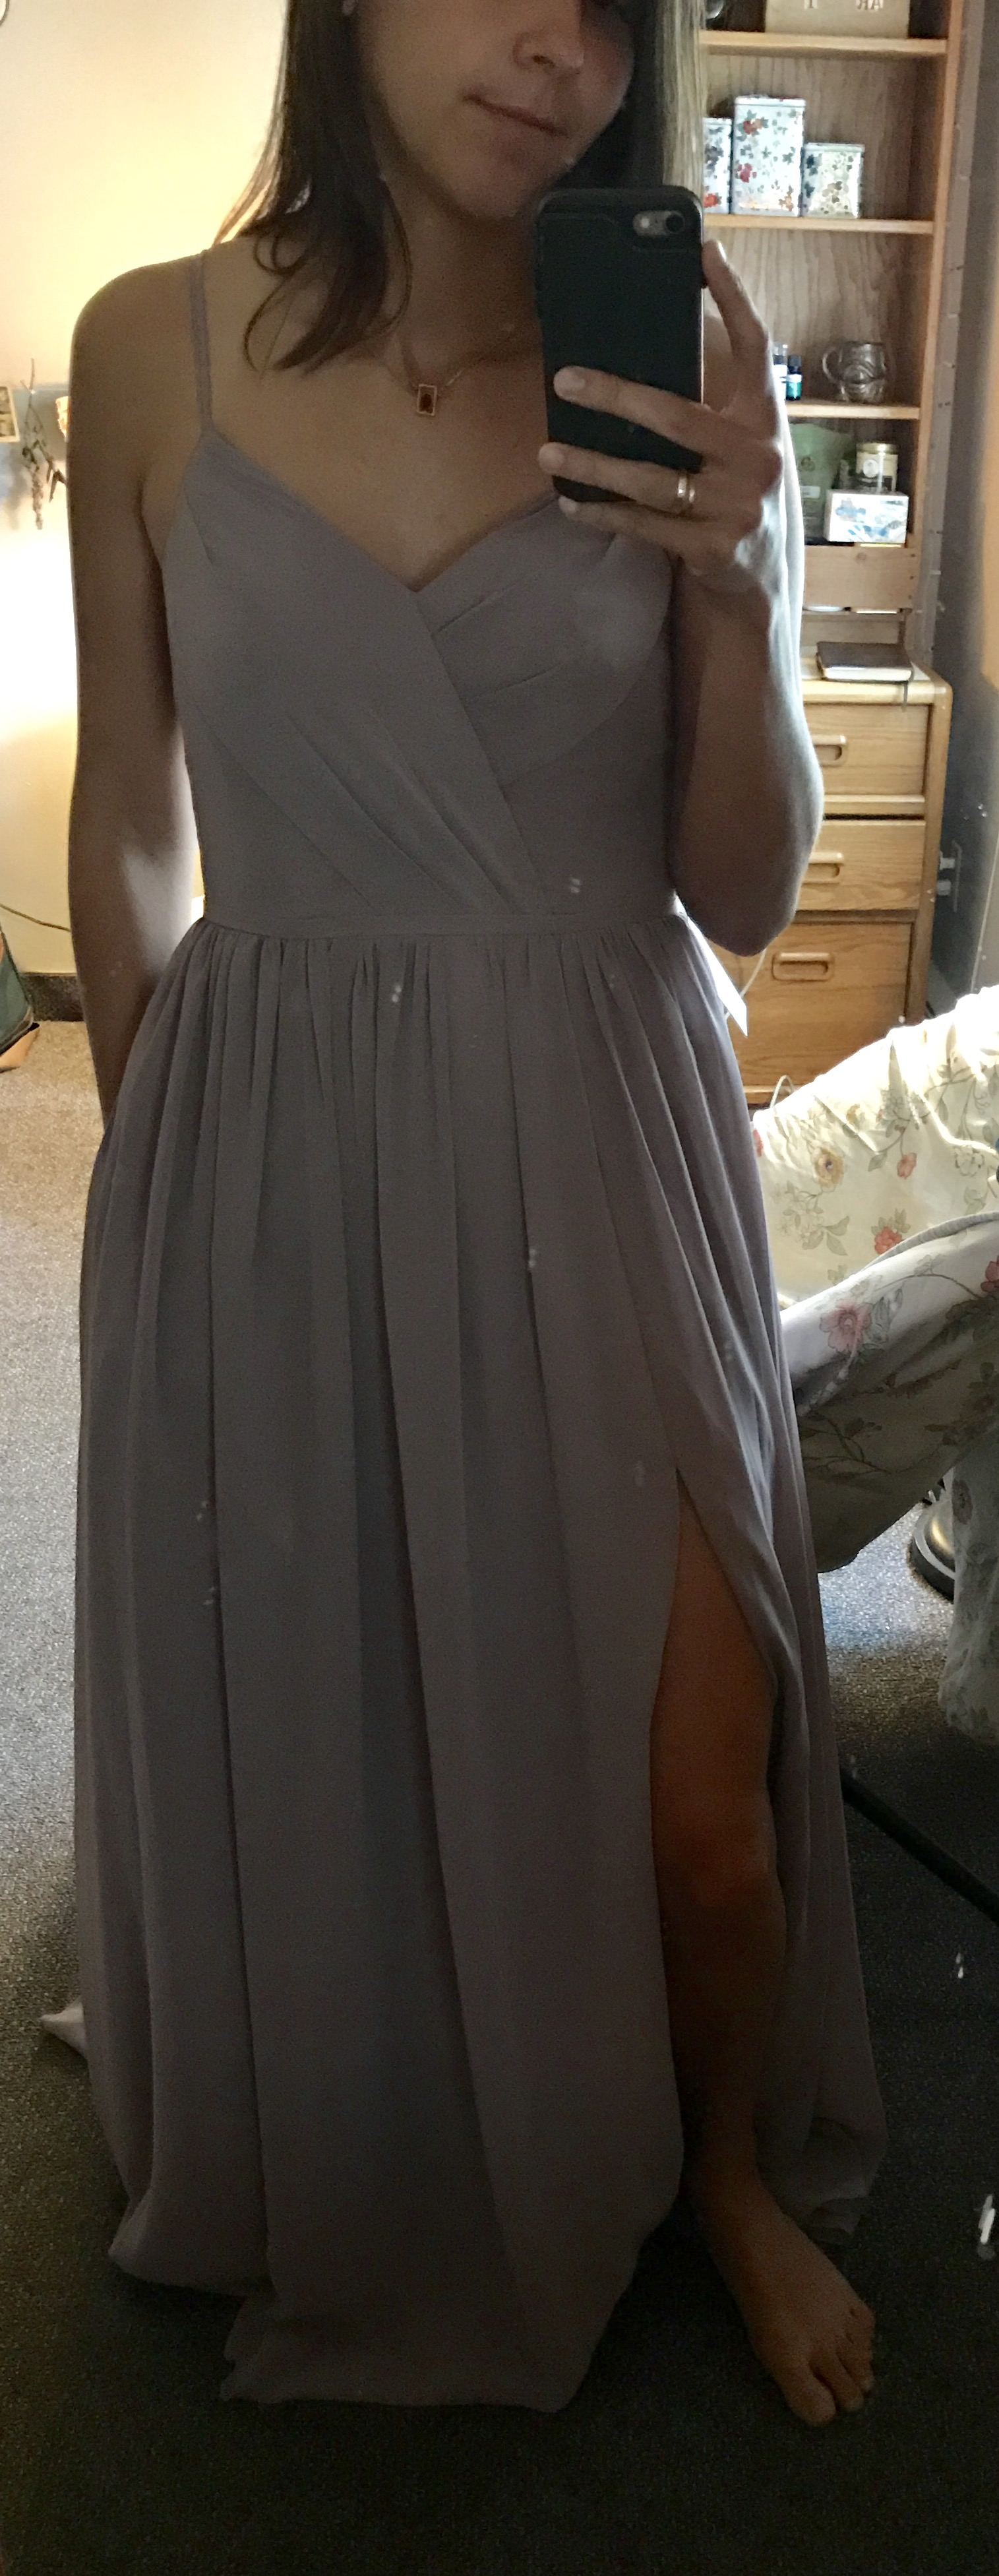 245dca1671b Azazie Bridesmaid Dresses Dusk - Gomes Weine AG